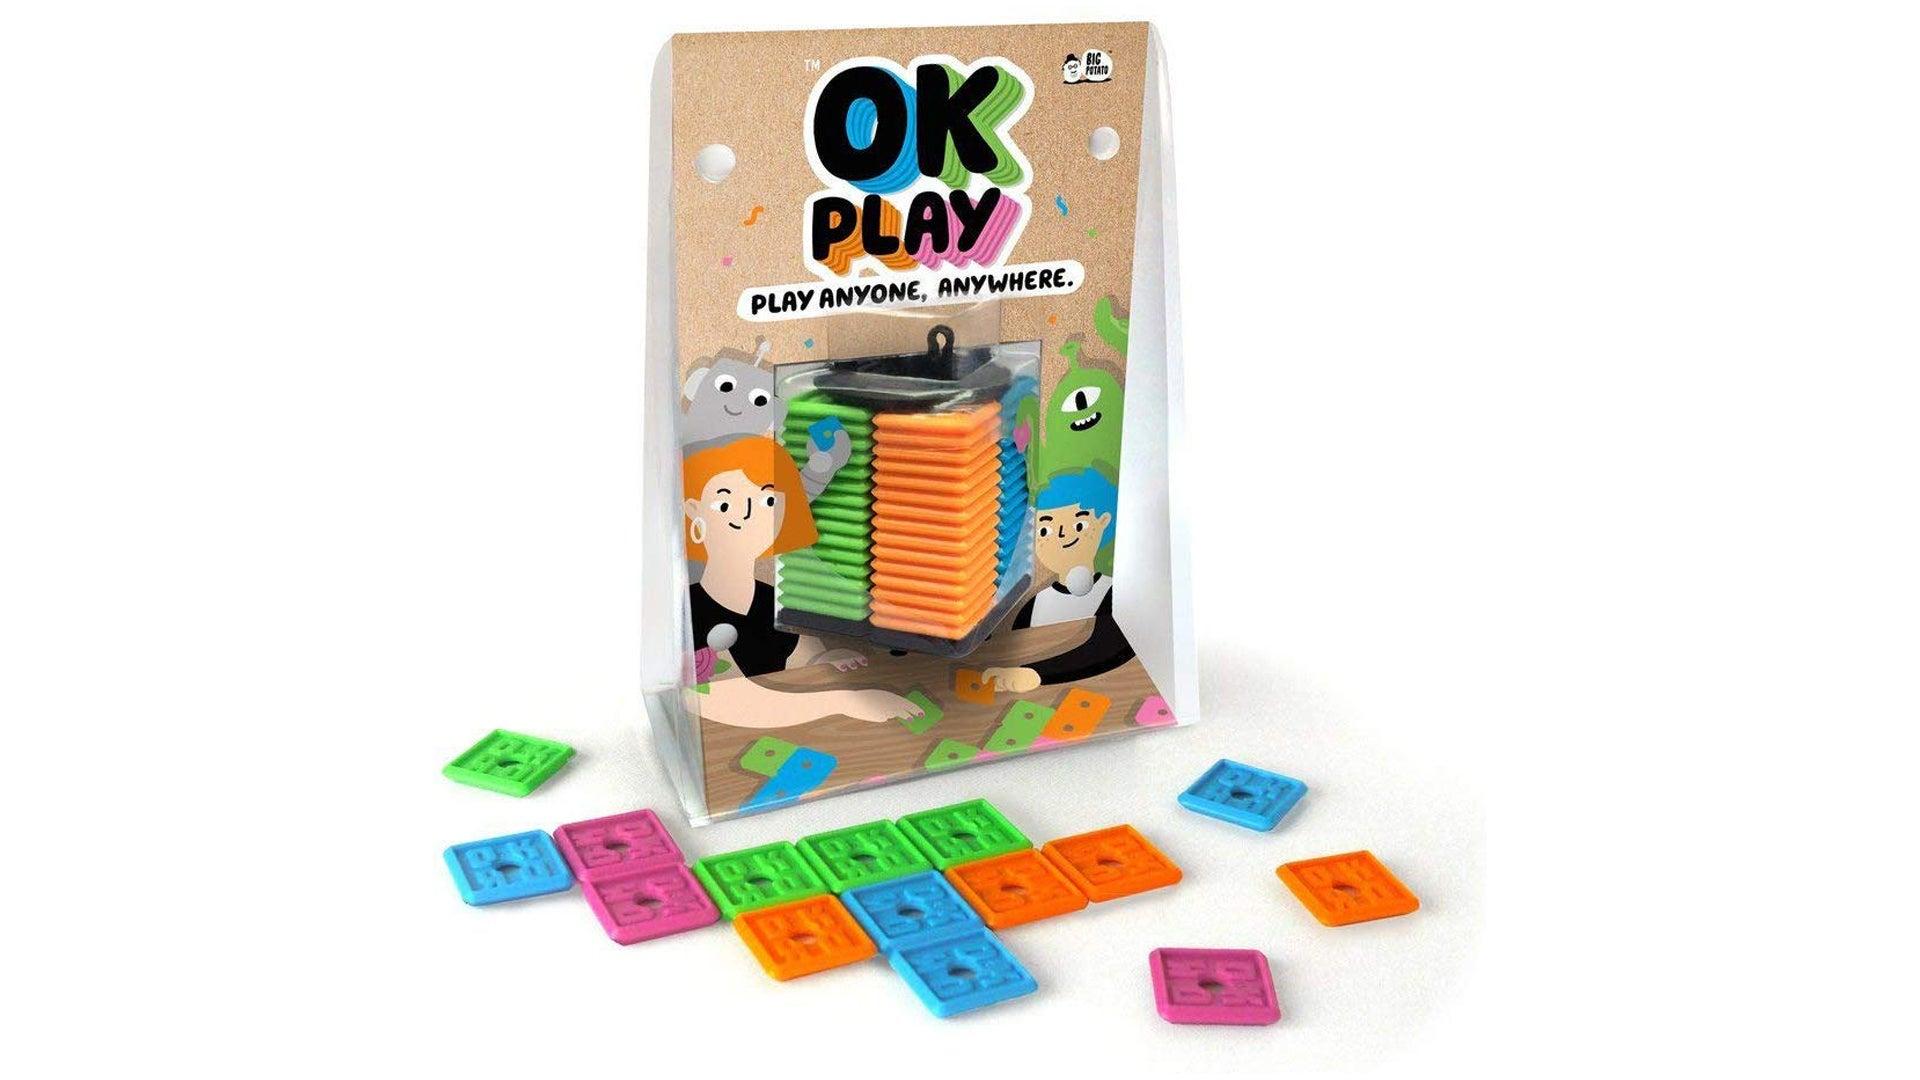 ok-play-cinco-link-board-game-box-gameplay.jpg